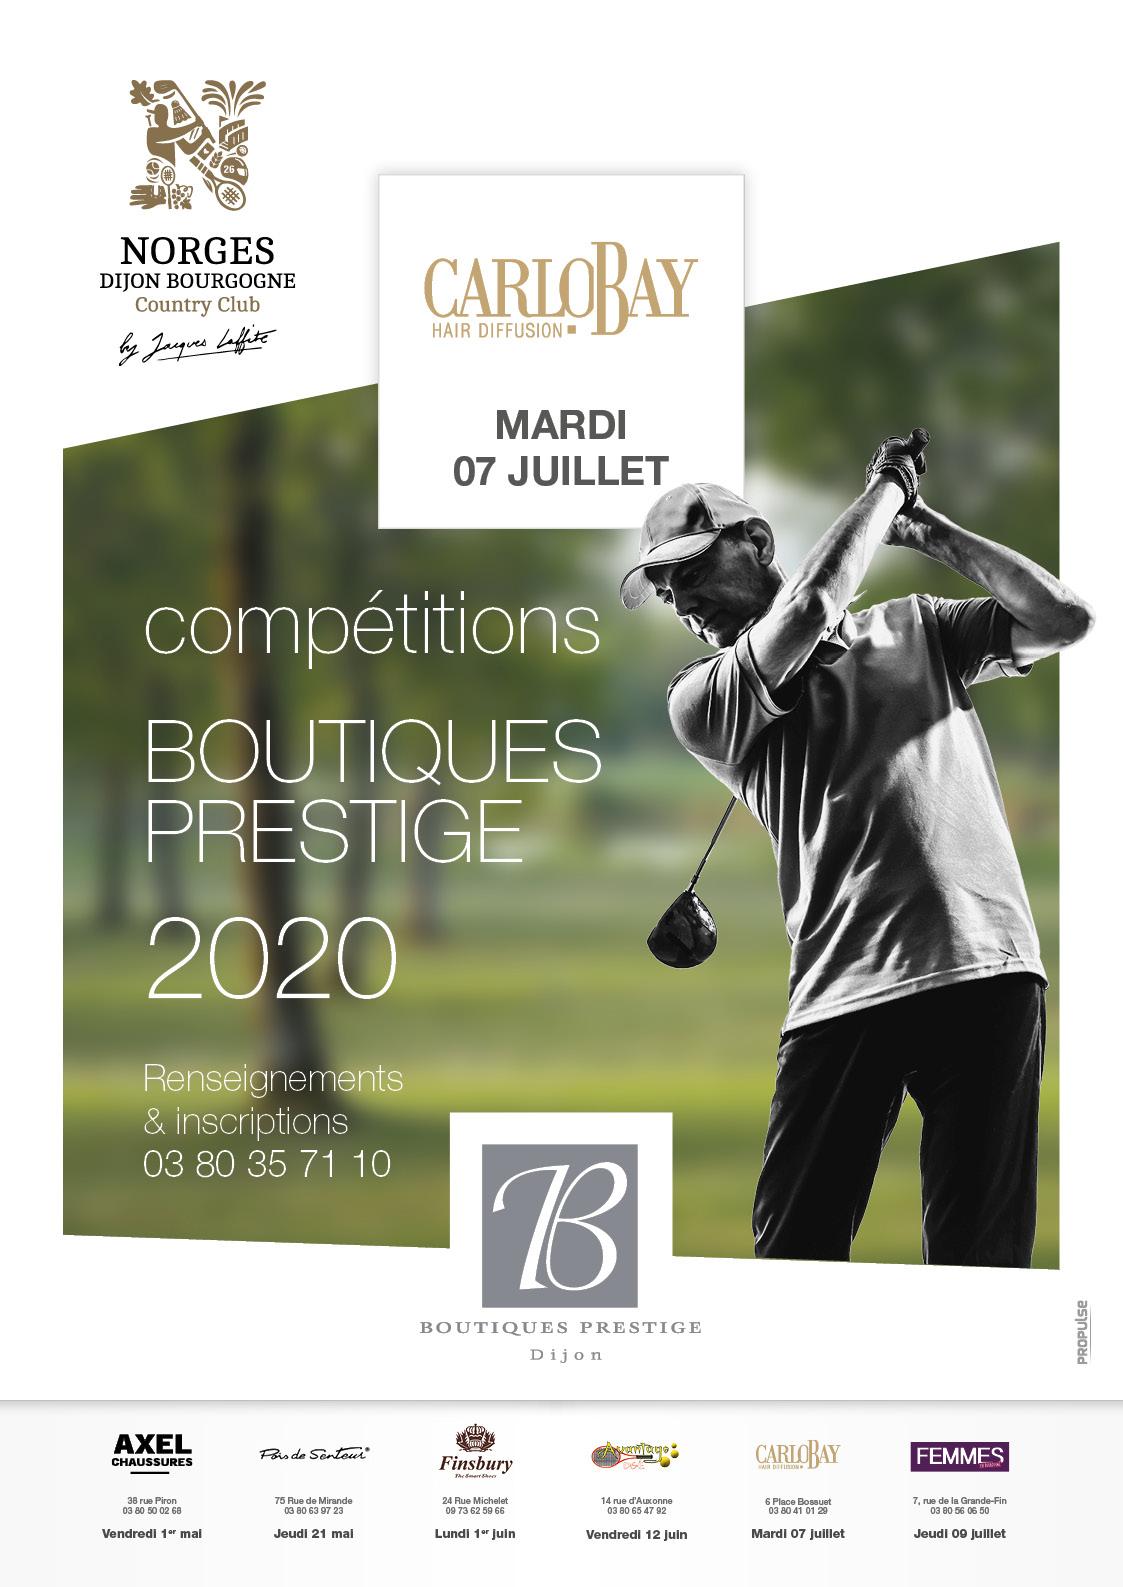 Boutiques prestige CarloBay